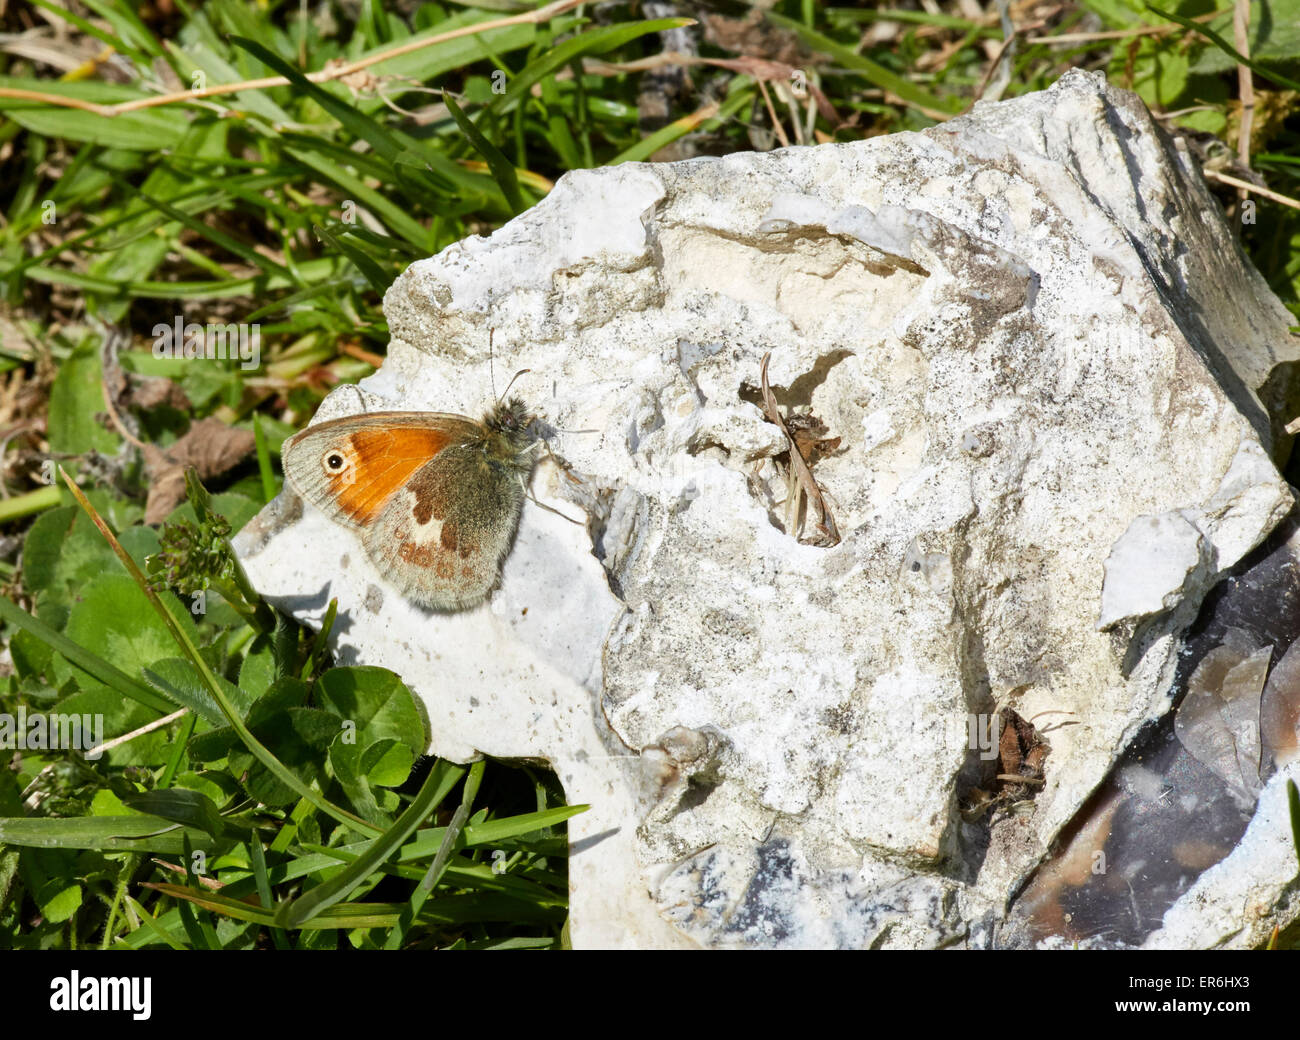 Small Heath sunning itself on a piece of chalk. Hutchinson's Bank Nature Reserve, New Addington, Surrey, England. - Stock Image